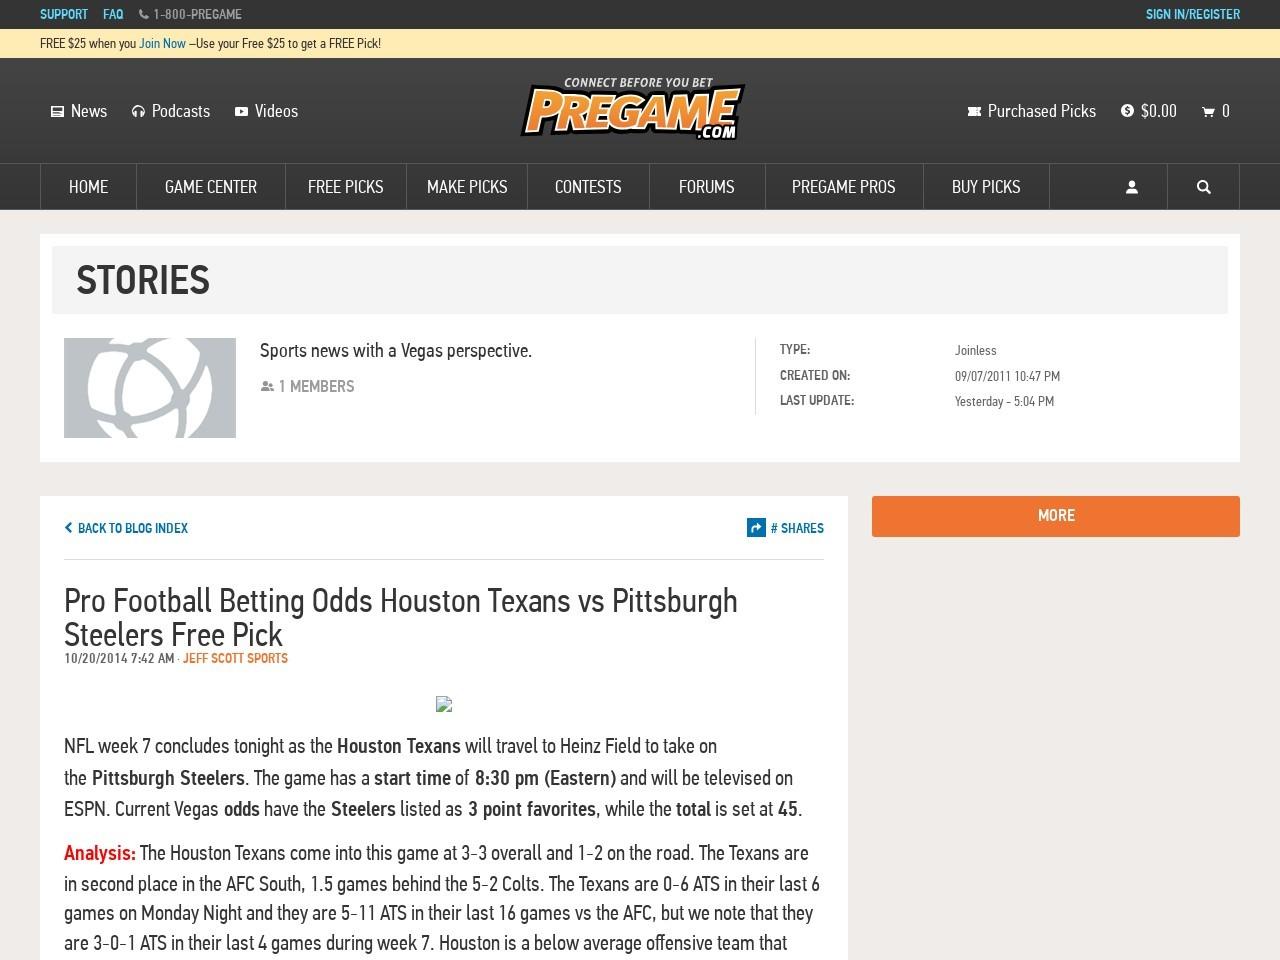 Pro Football Betting Odds Houston Texans vs Pittsburgh …